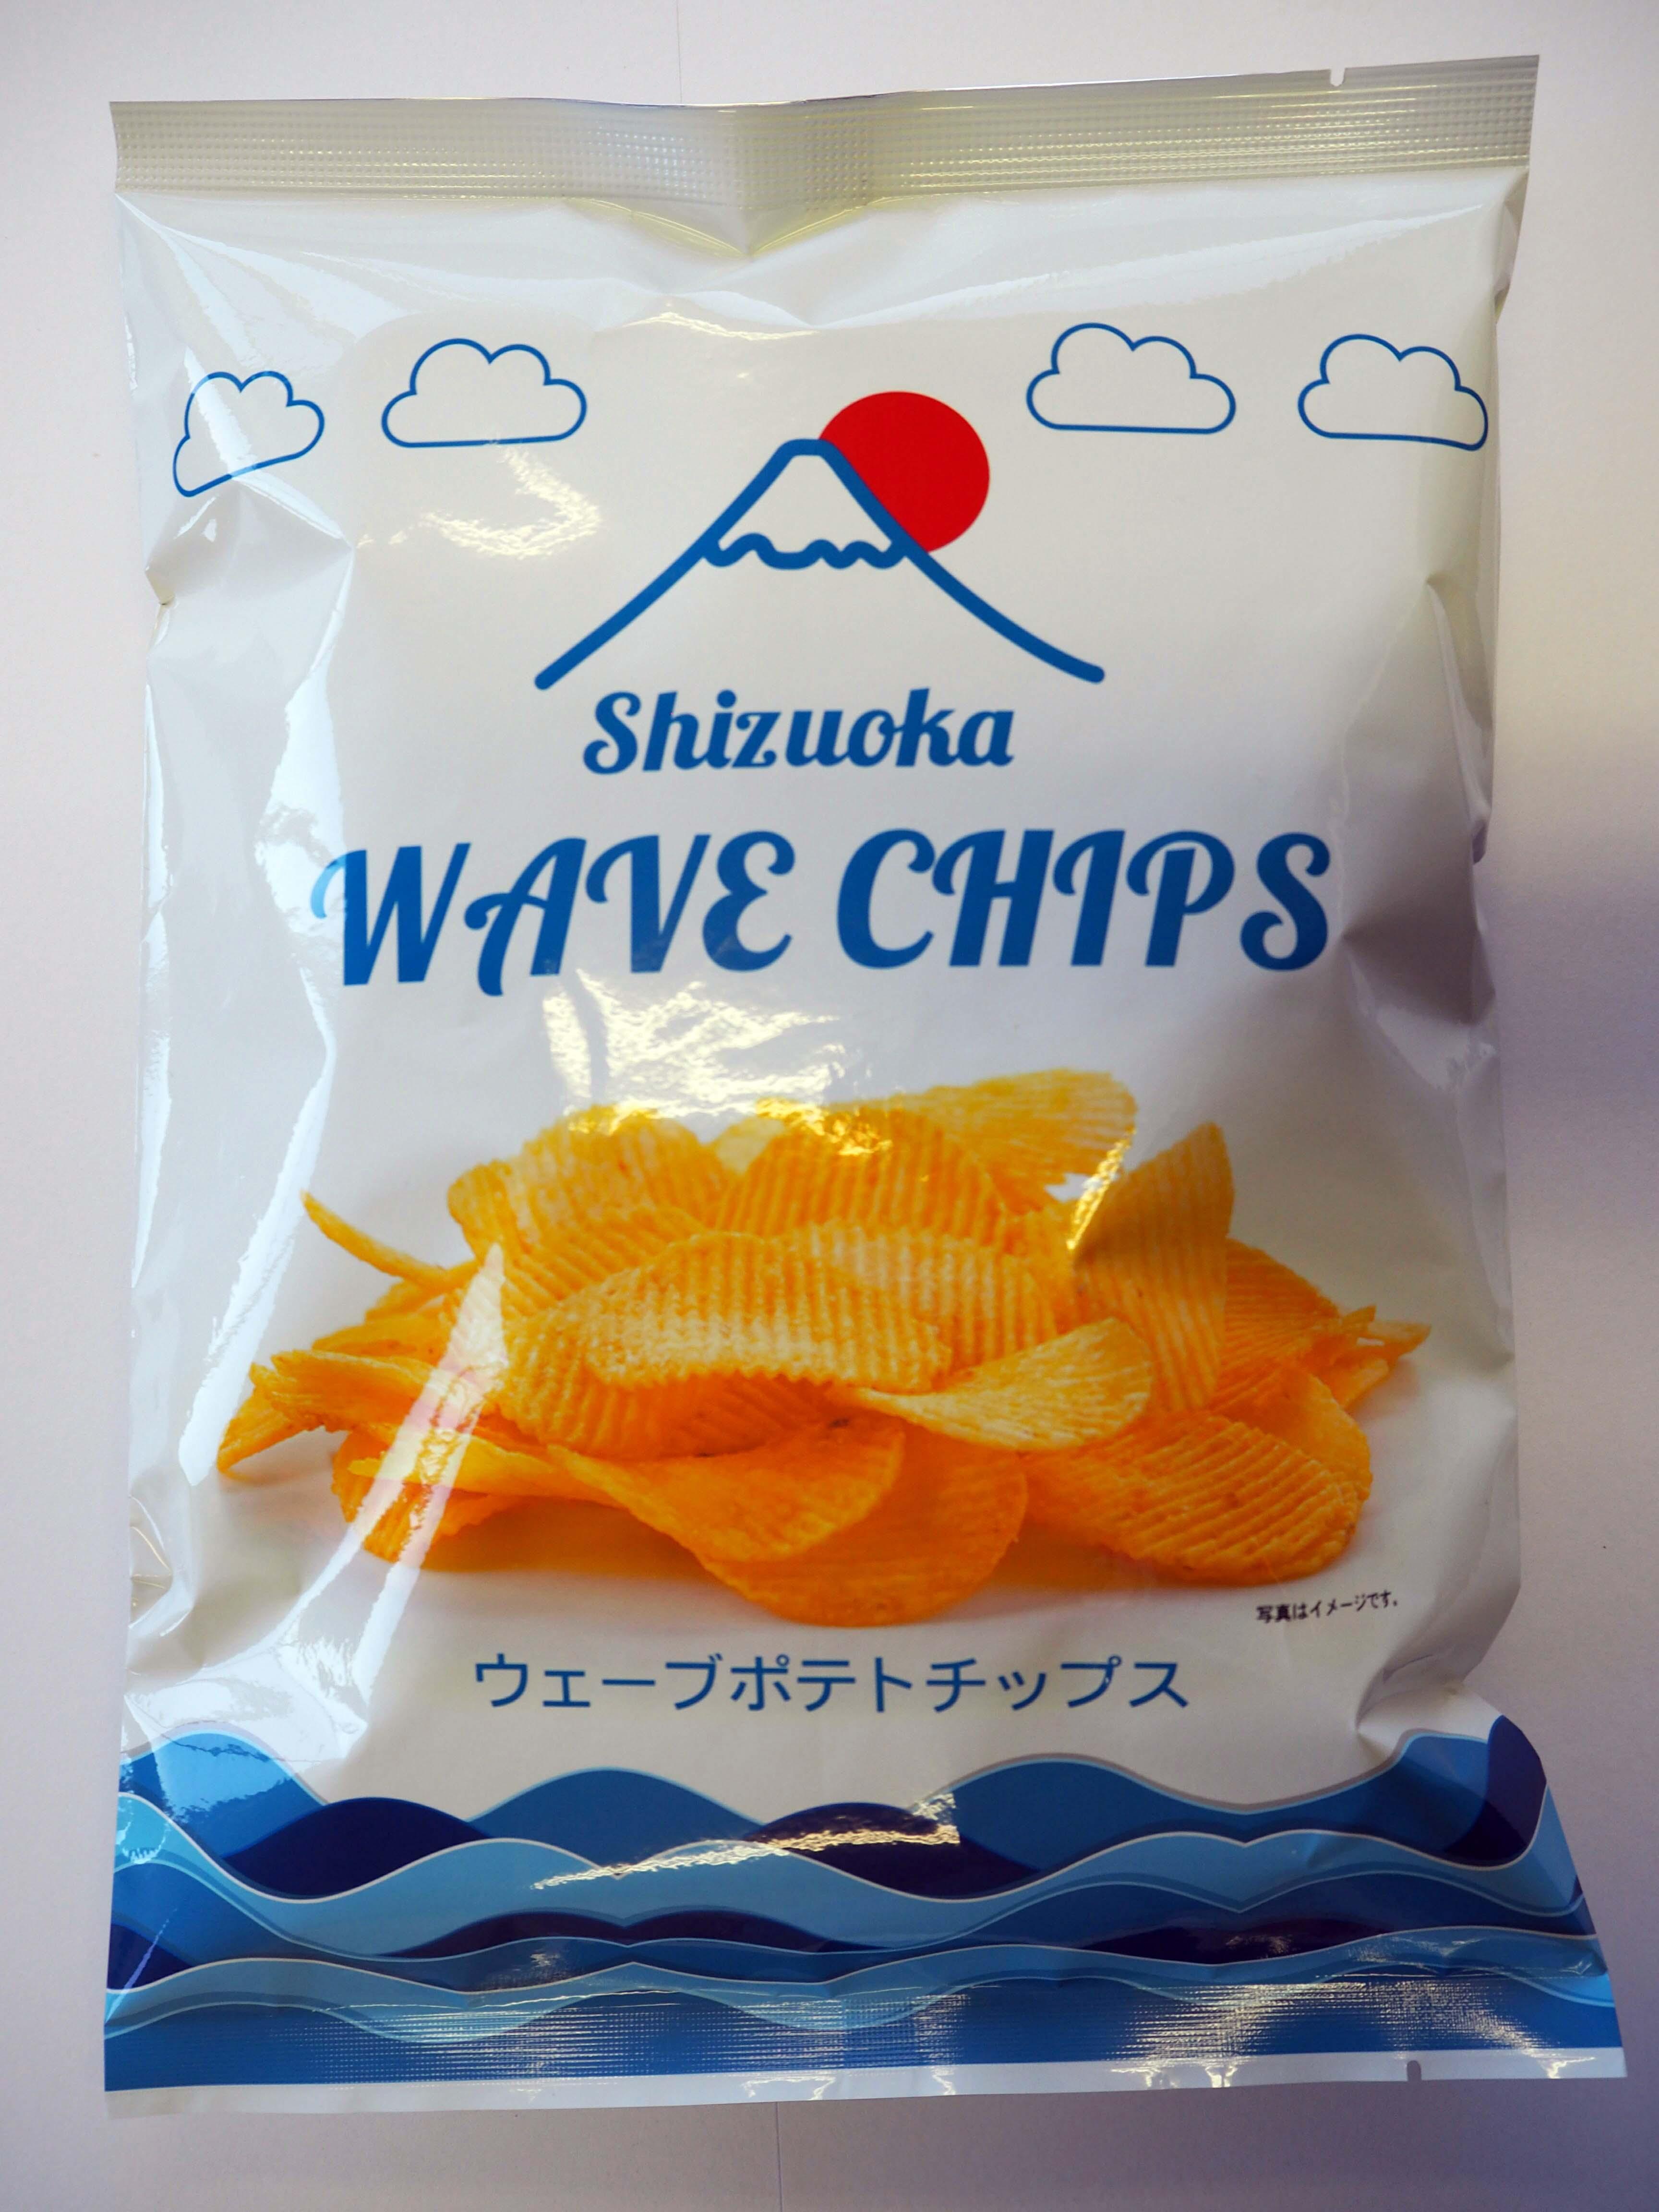 WAVEチップス